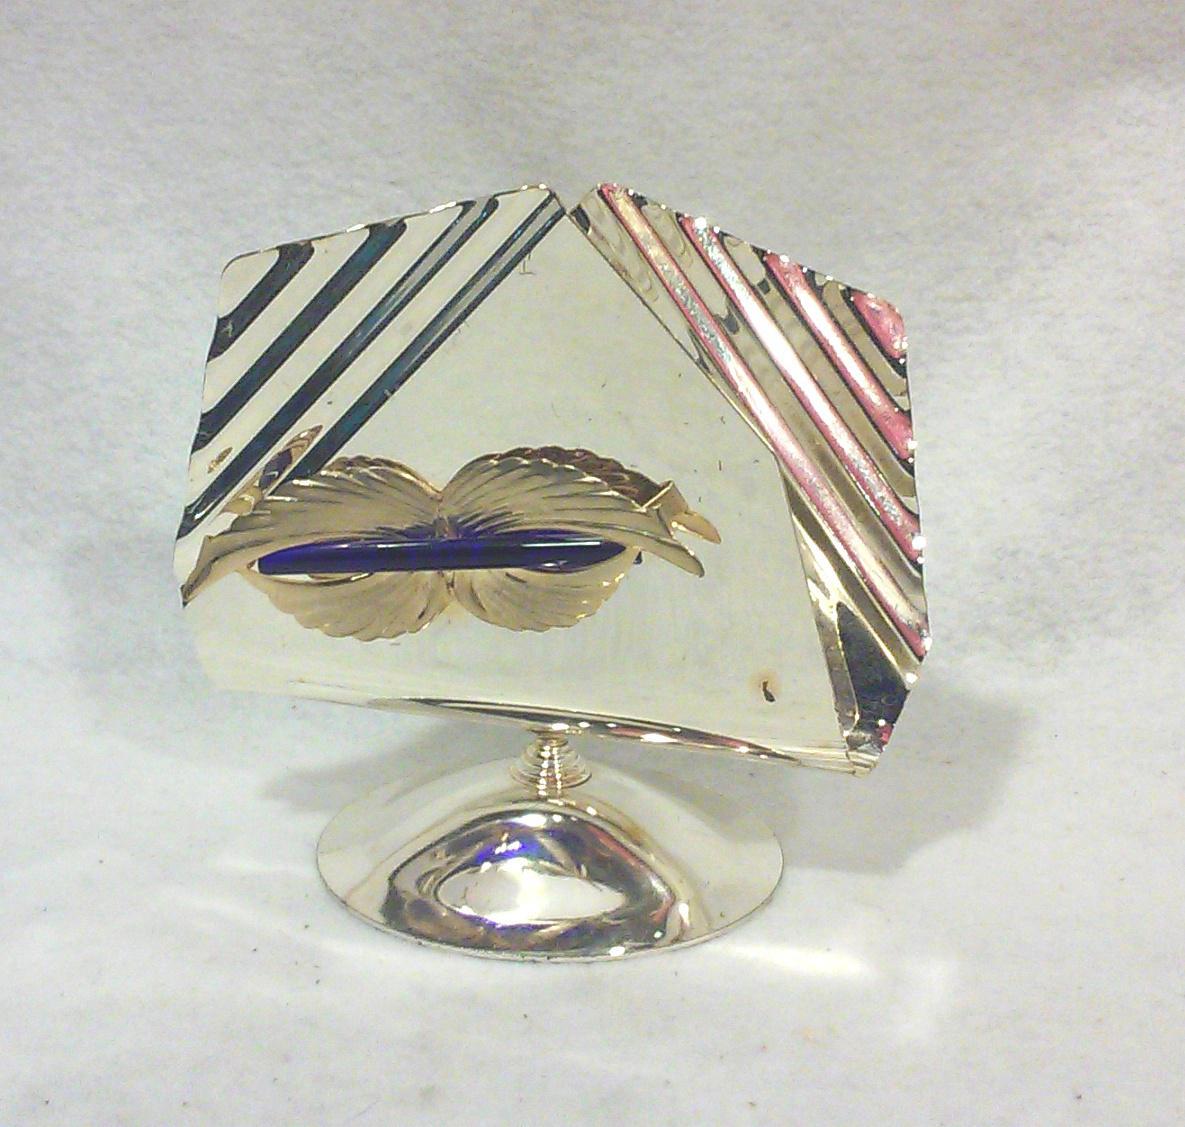 Italian Art Deco Silverplated Napkin Holder - Image 2 of 4  sc 1 st  Chairish & Italian Art Deco Silverplated Napkin Holder | Chairish